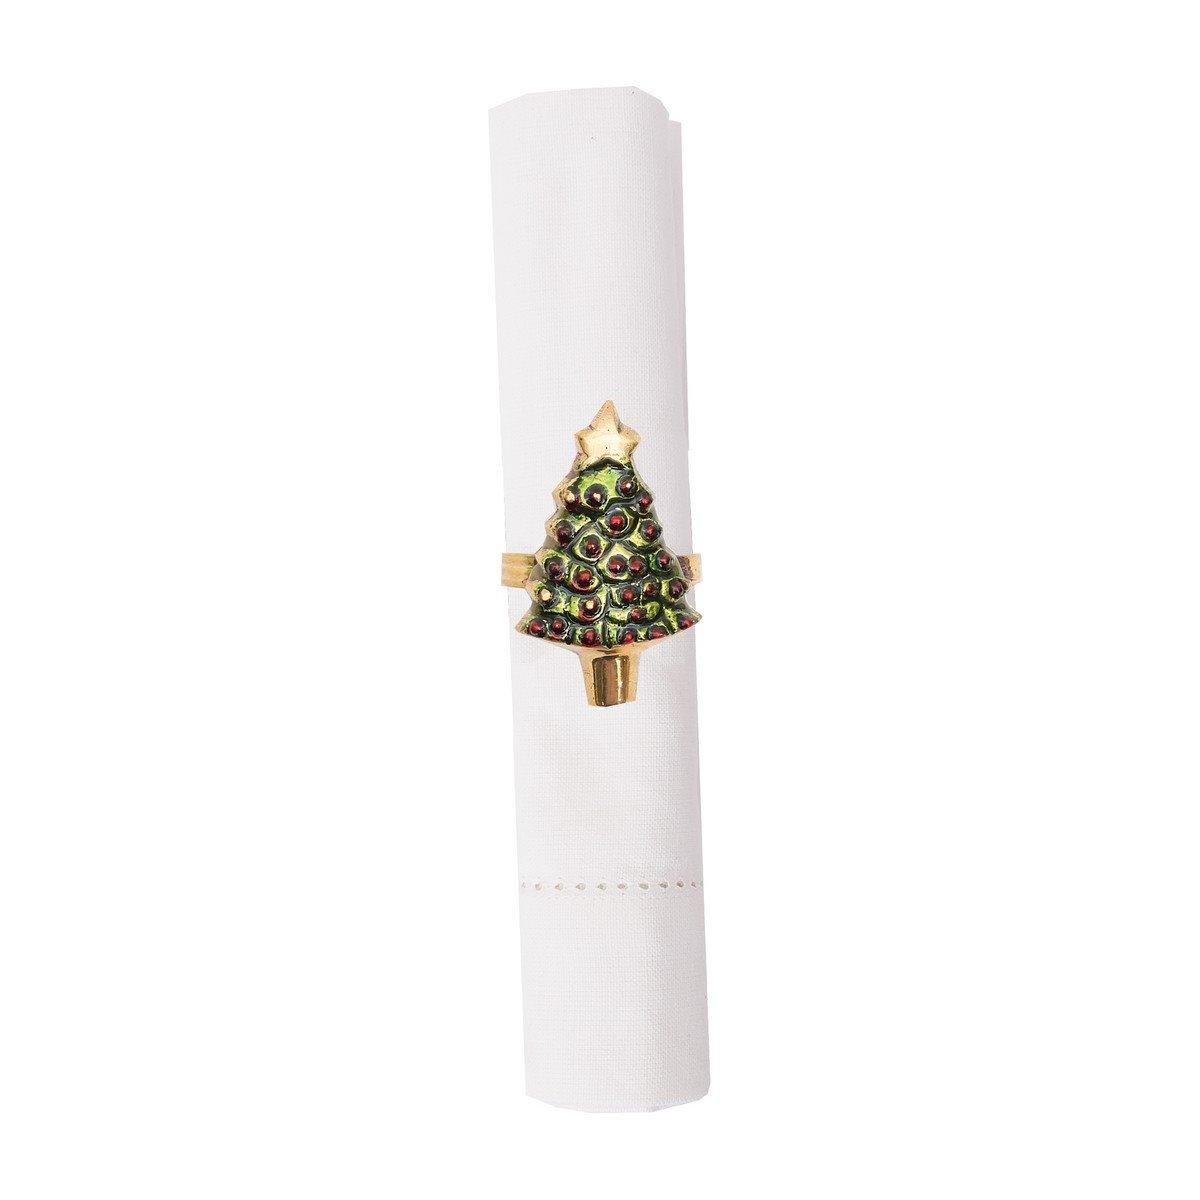 Painted Christmas Tree Napkin Ring